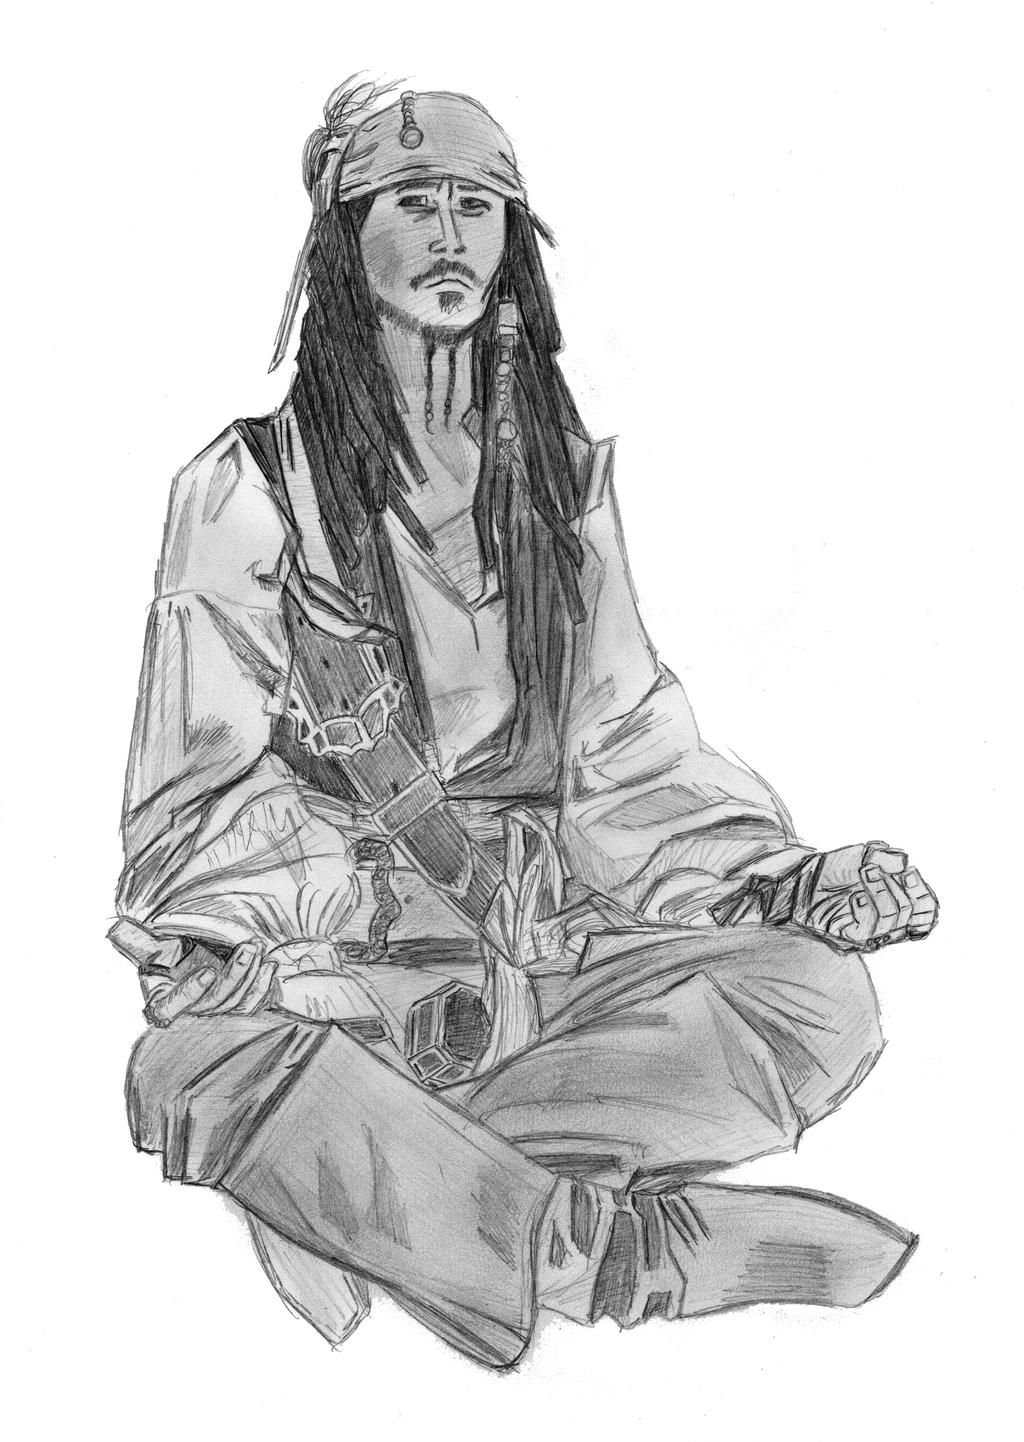 Jack Sparrow 2006 by elodie50a